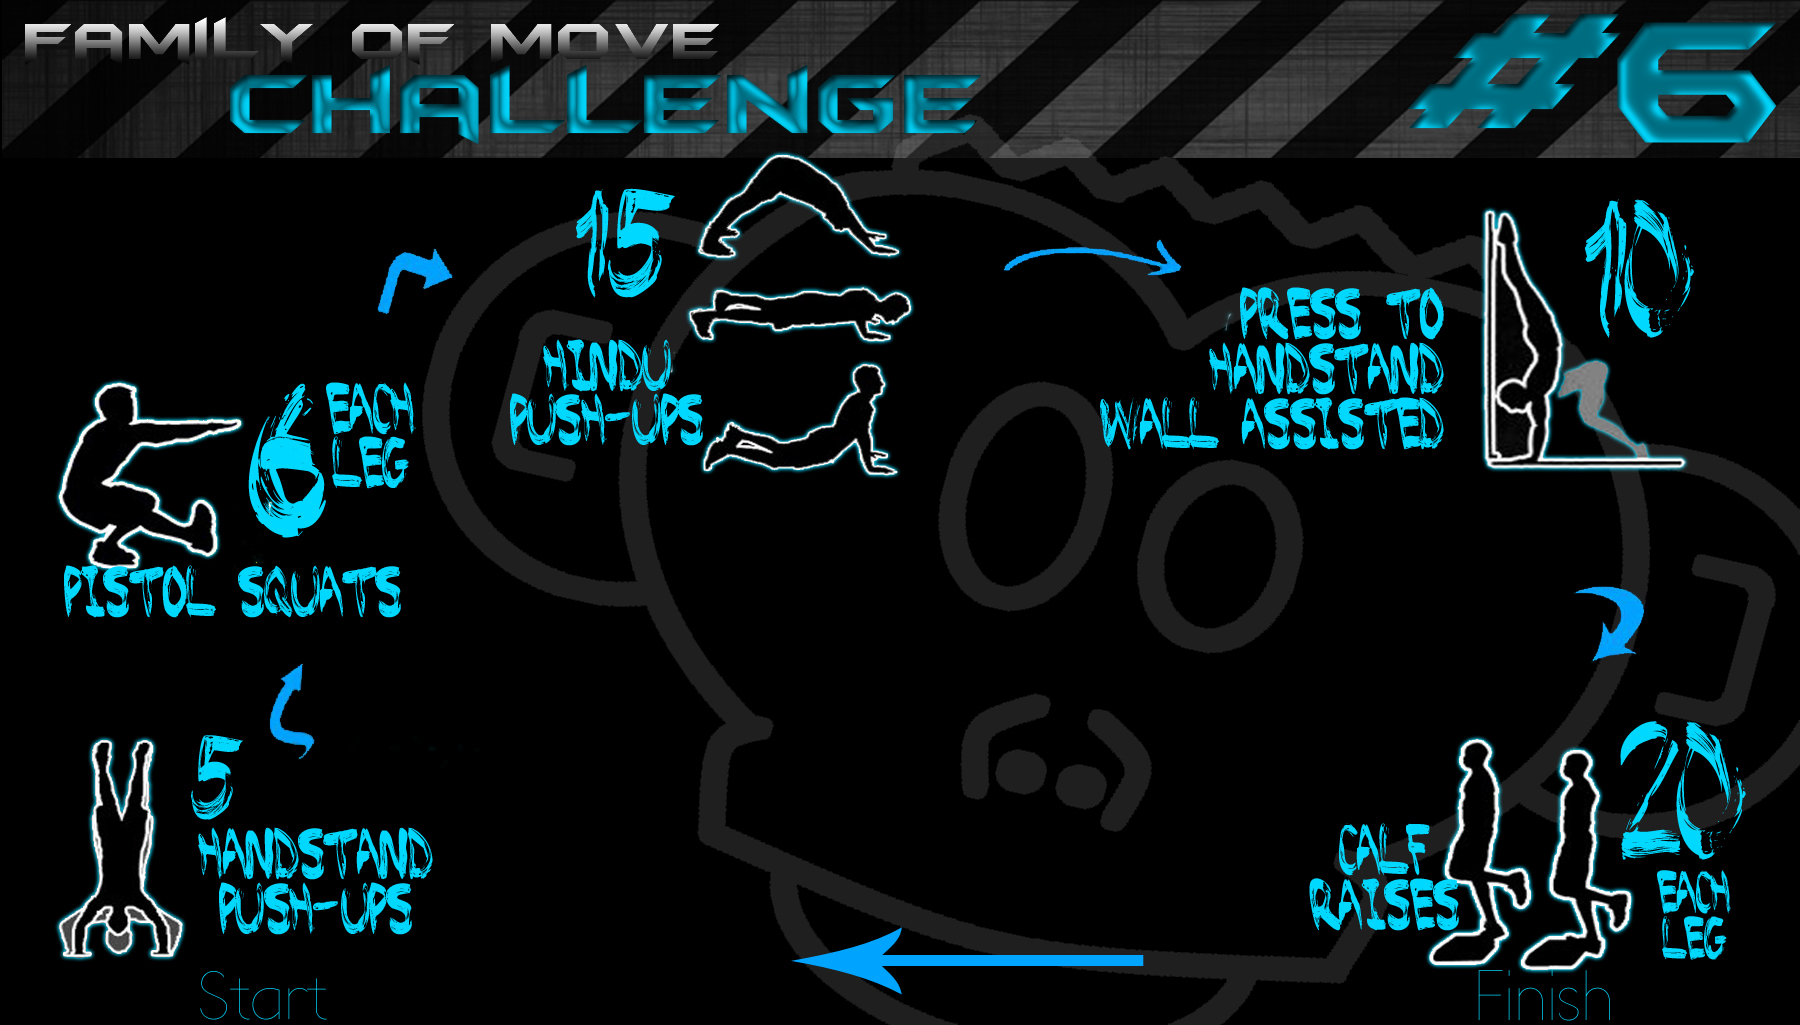 FamilyOfMove-challenge-6